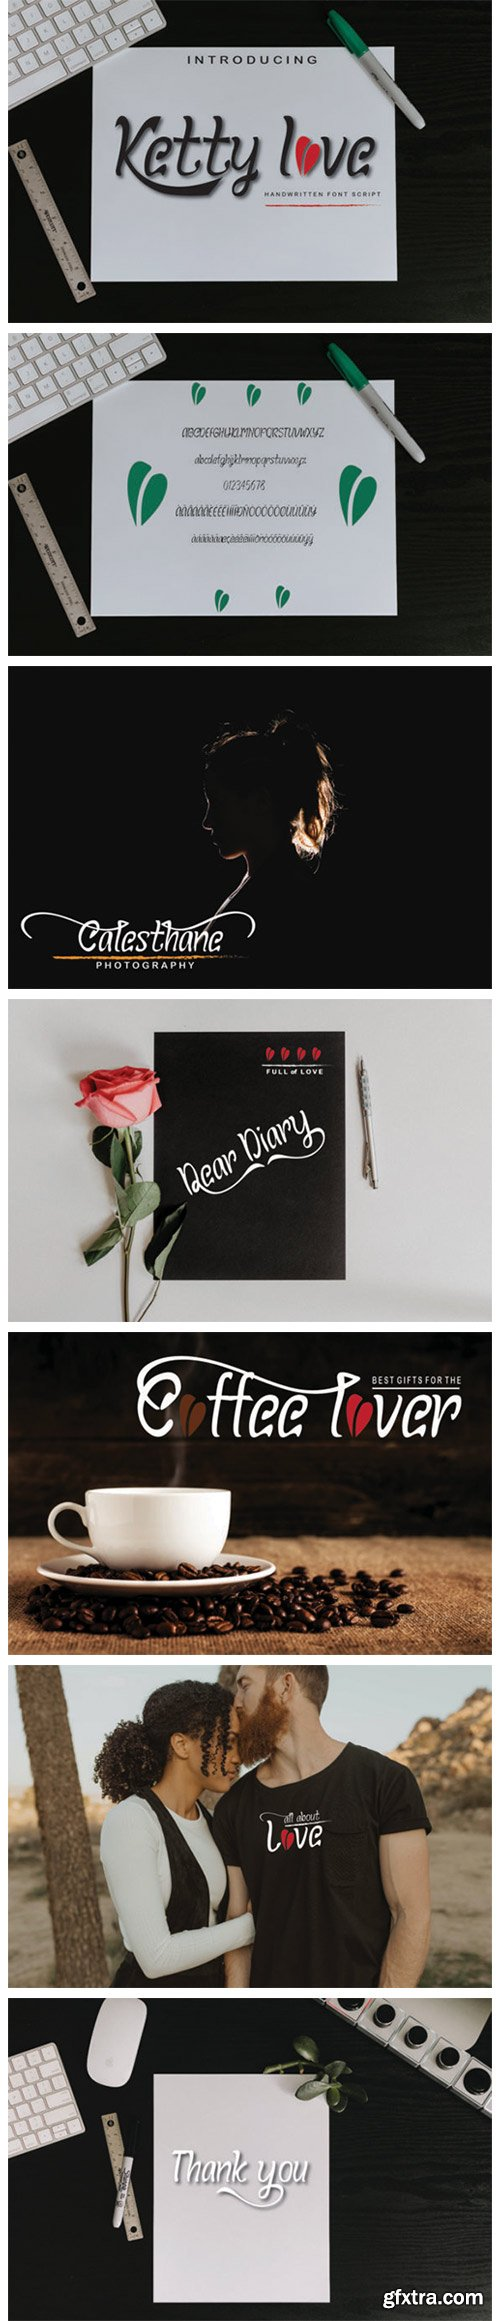 Ketty Love Font